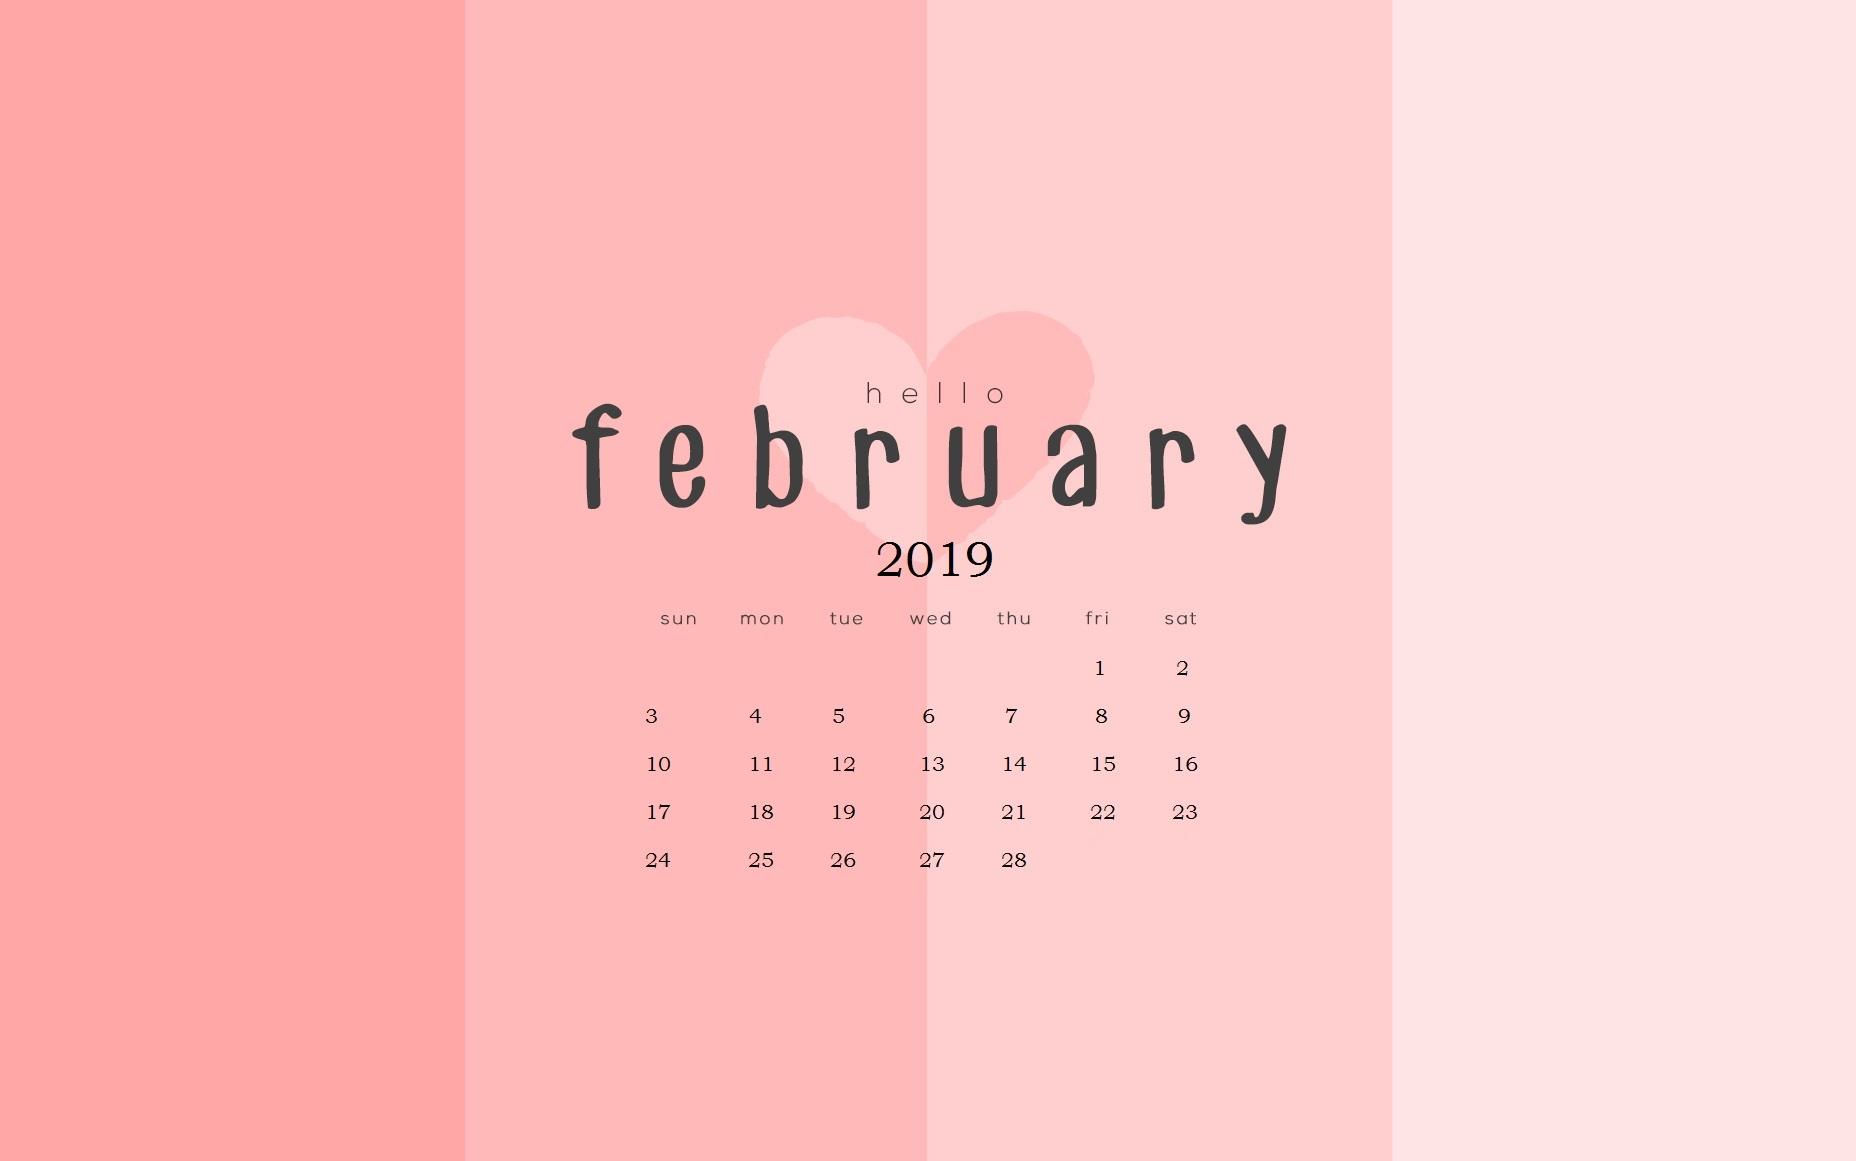 february 2019 calendar wallpapers calendar 2019::February 2019 Desktop Calendar